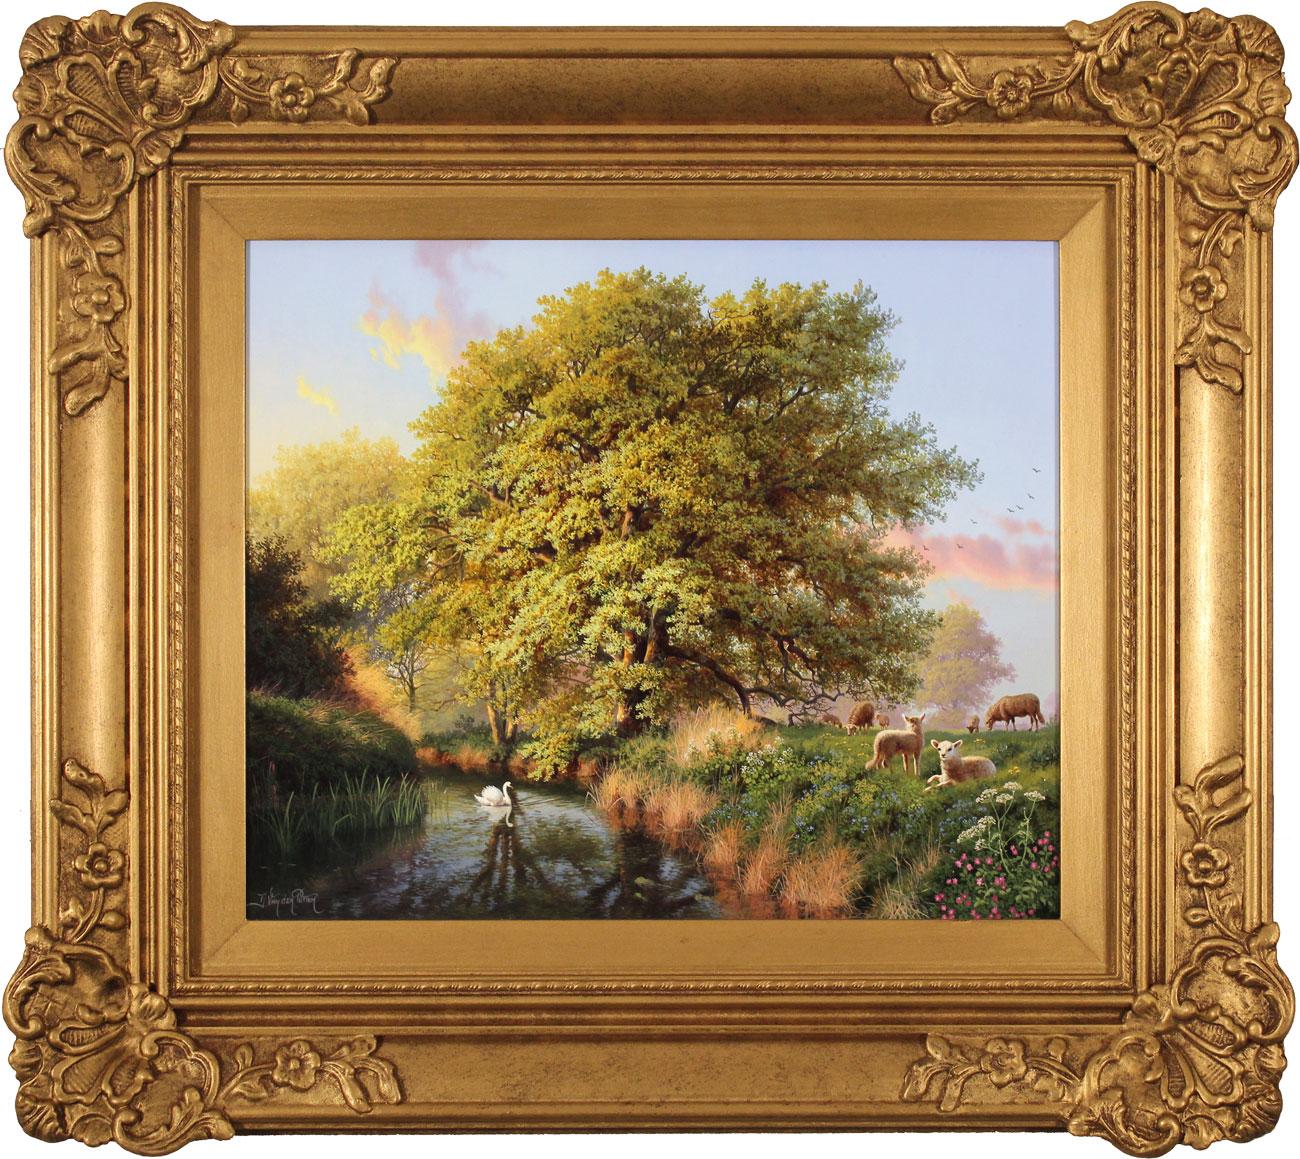 Daniel Van Der Putten, Original oil painting on panel, Beside the River Swale, Yorkshire Click to enlarge